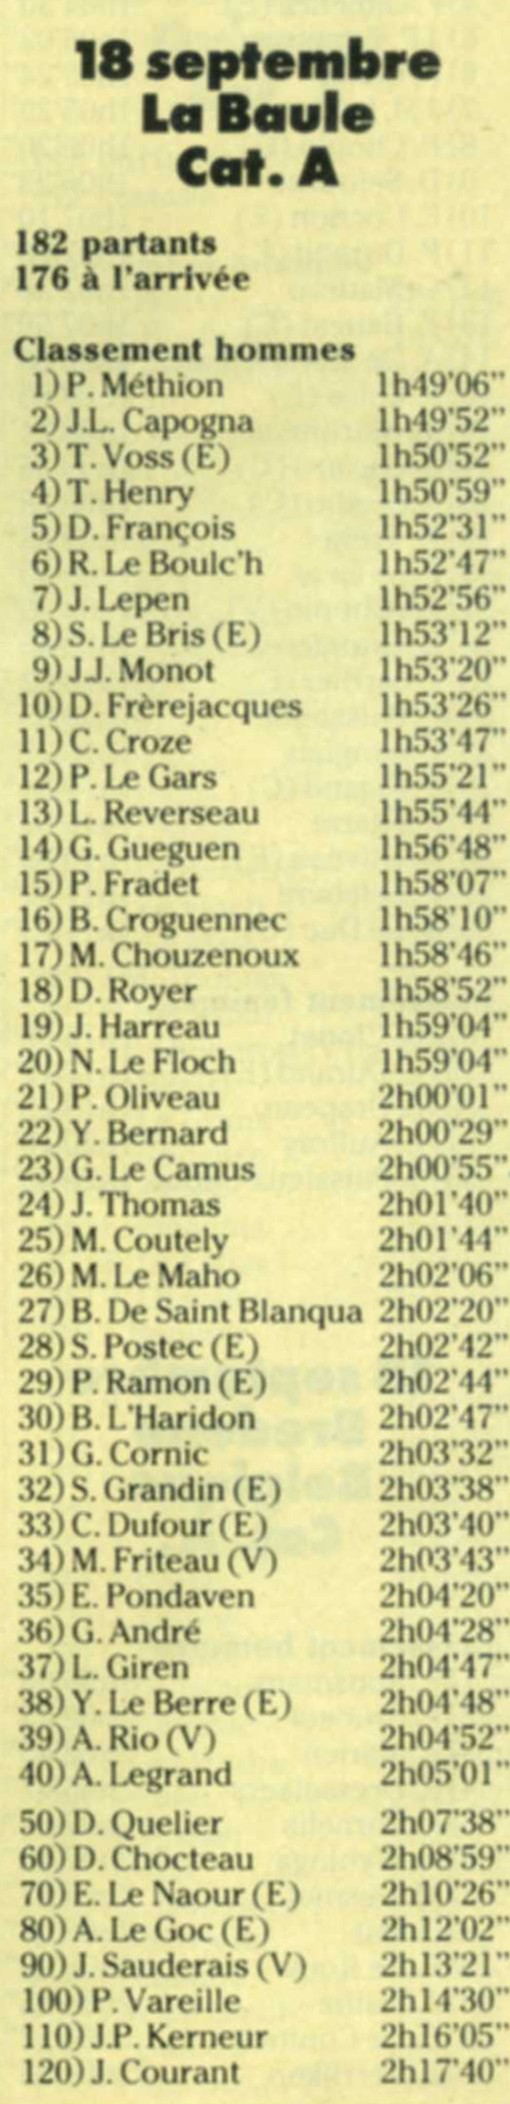 img[A]072_18-septembre-1988_résultats_1